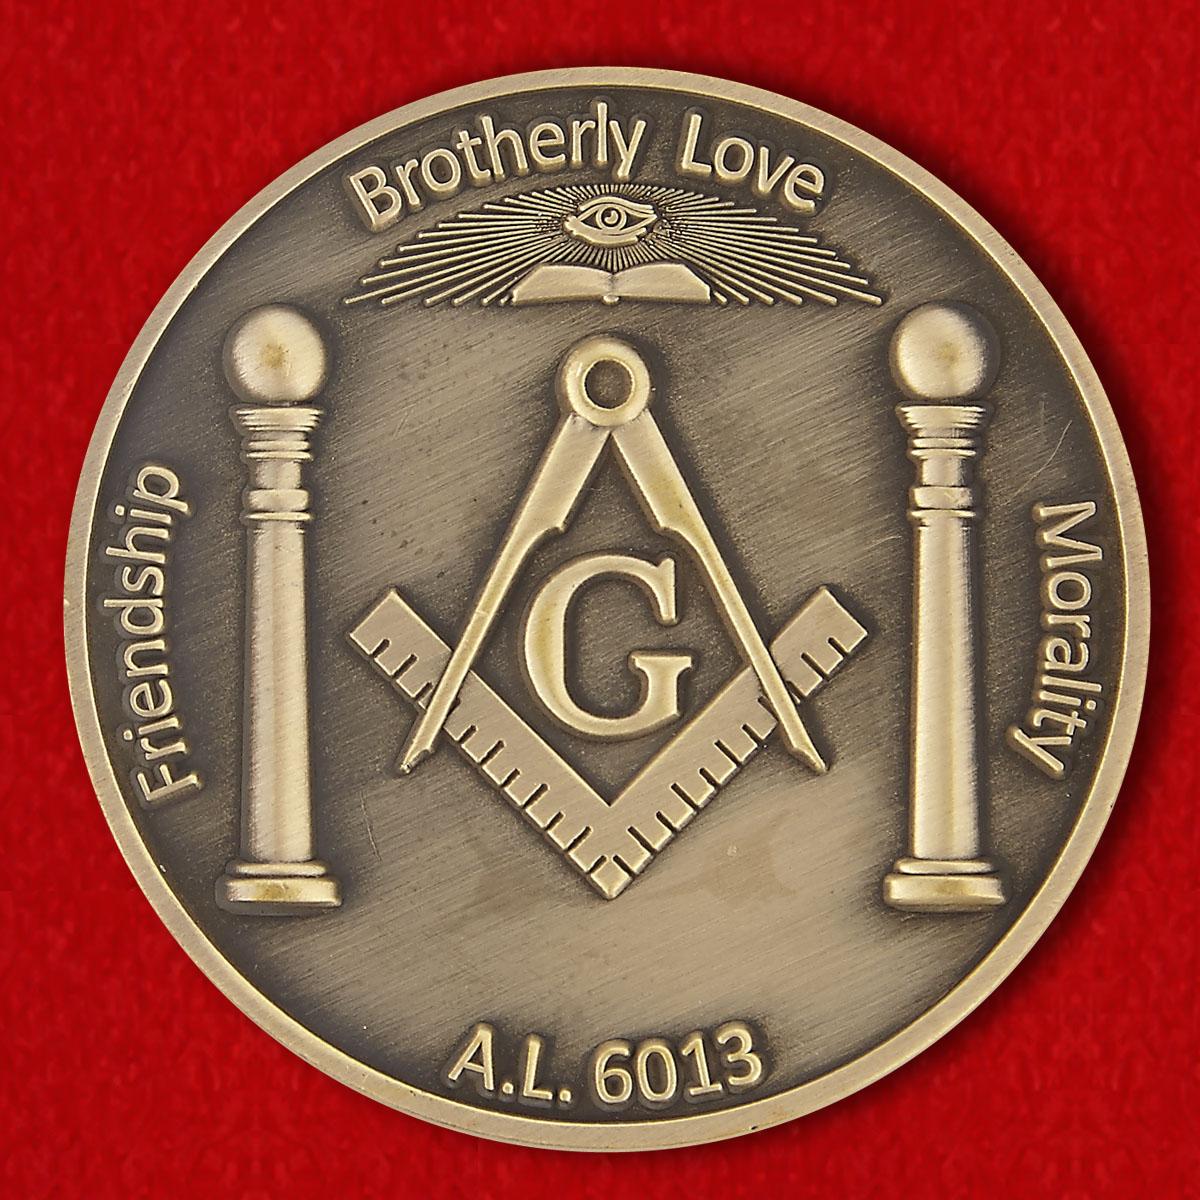 Douglas Lorge # 153 Castle Rock, Colorado Challenge Coin